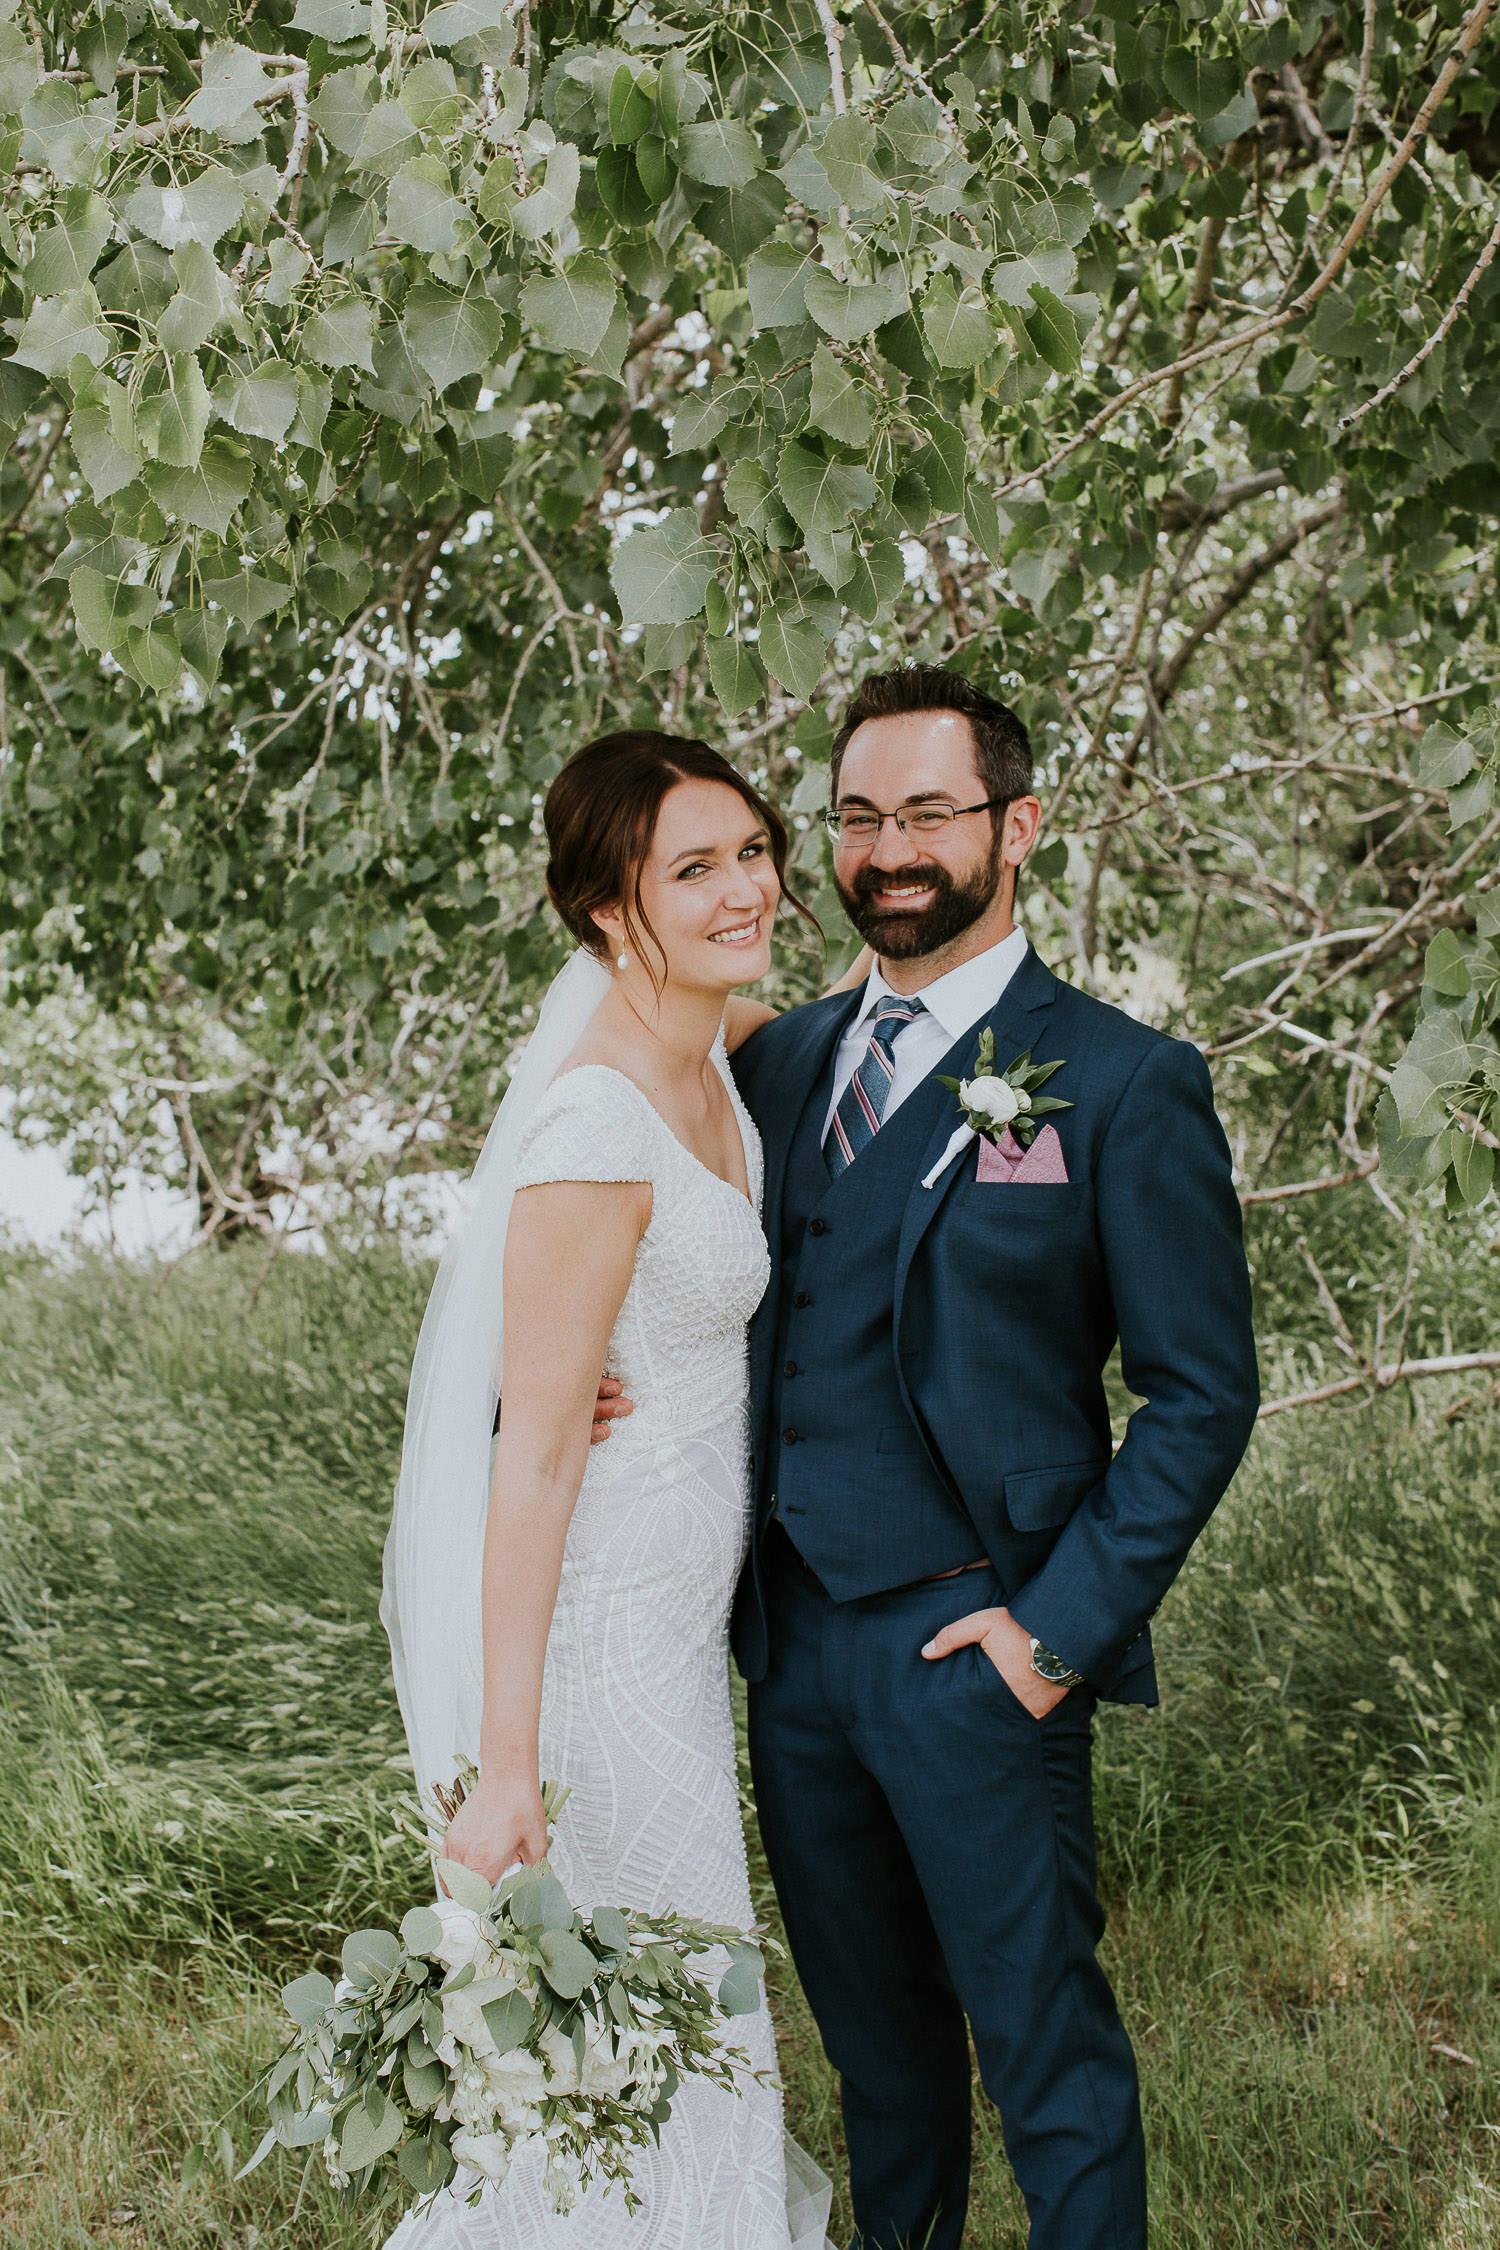 summer-backyard-wedding-in-alberta-sarah-pukin-0051